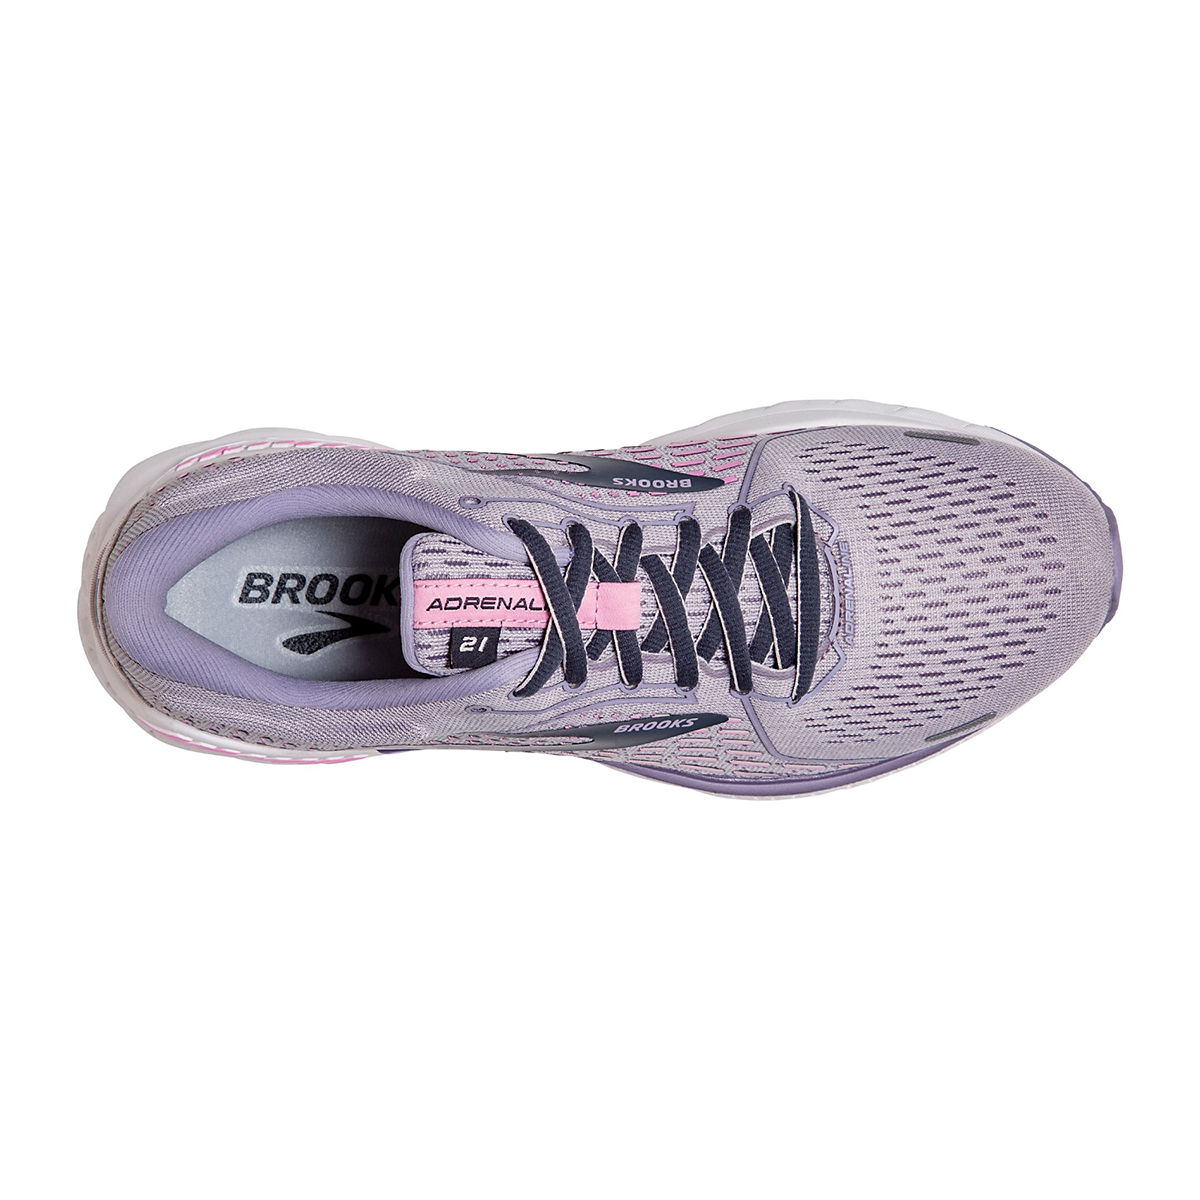 Women's Brooks Adrenaline GTS 21 Running Shoe - Color: Iris/Lilac  - Size: 5 - Width: Regular, Iris/Lilac, large, image 2